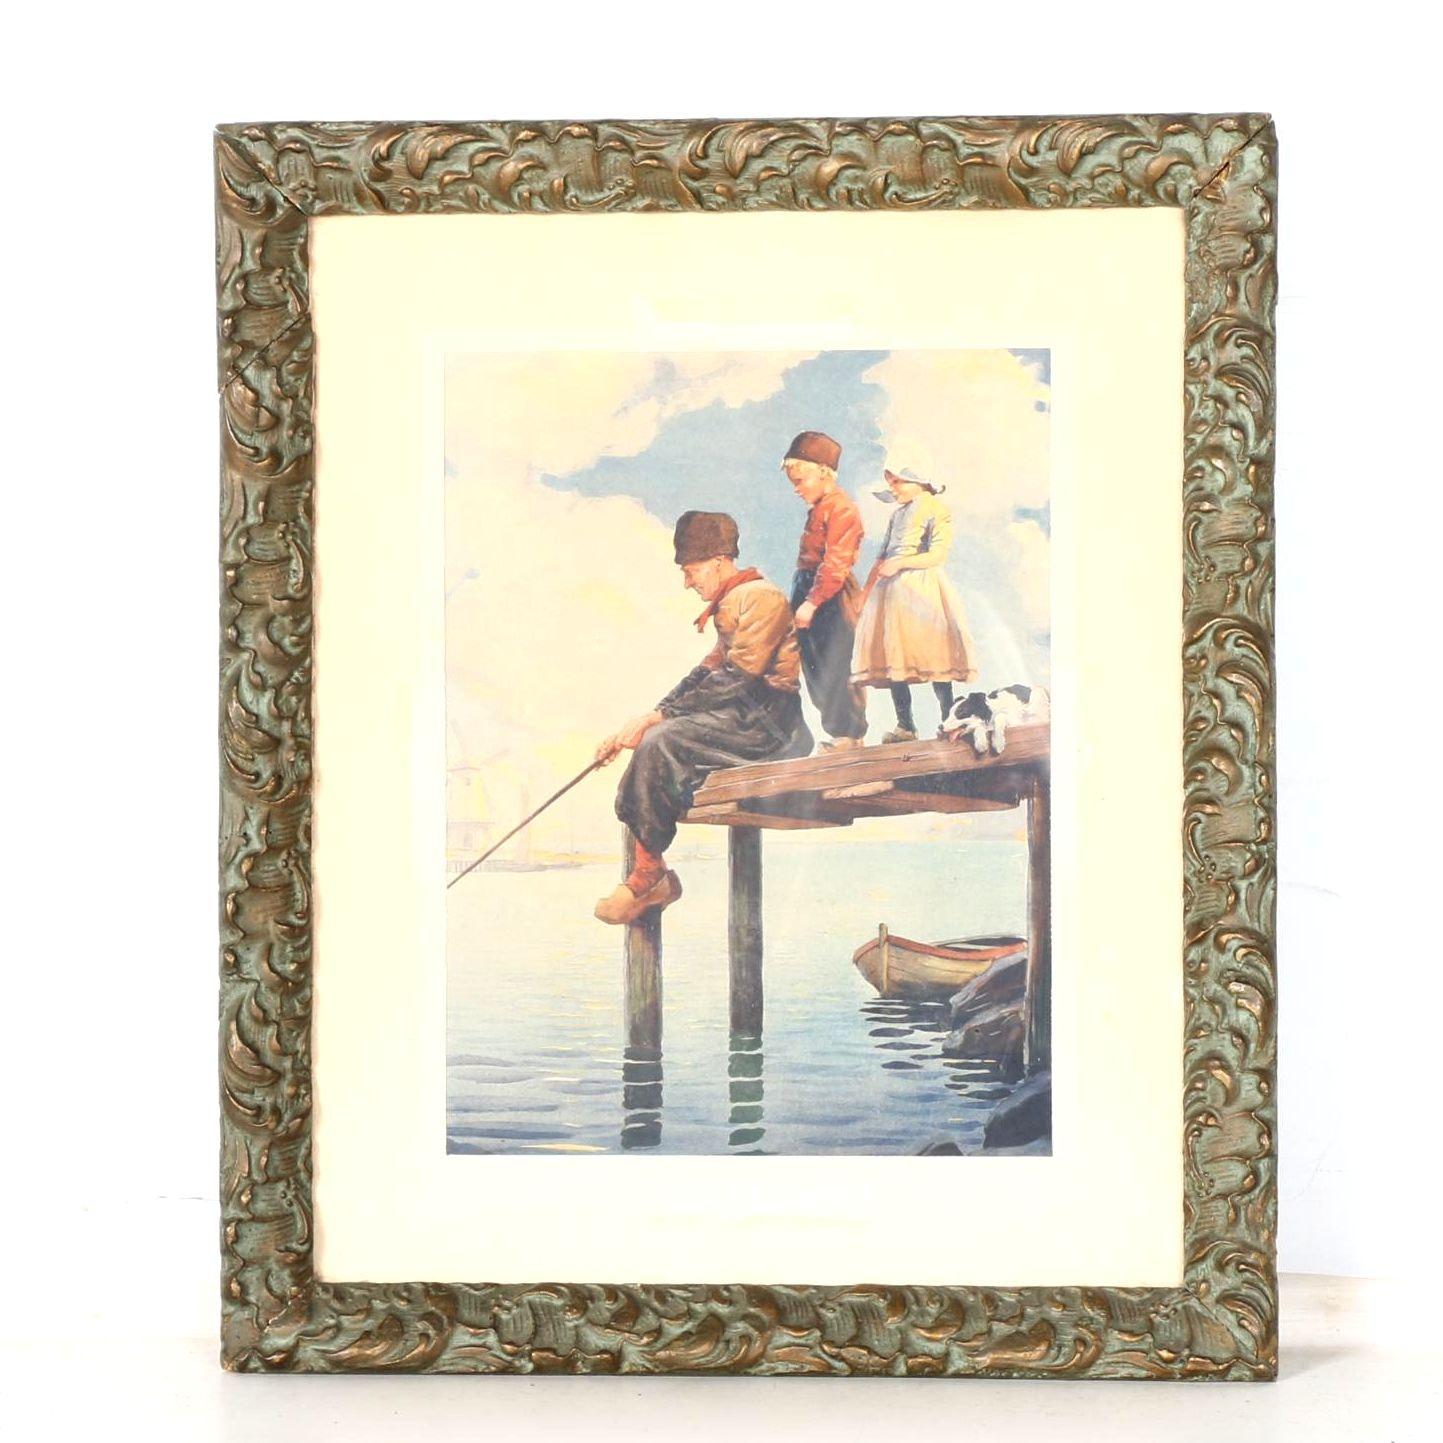 Framed Lithograph of Fishing Scene